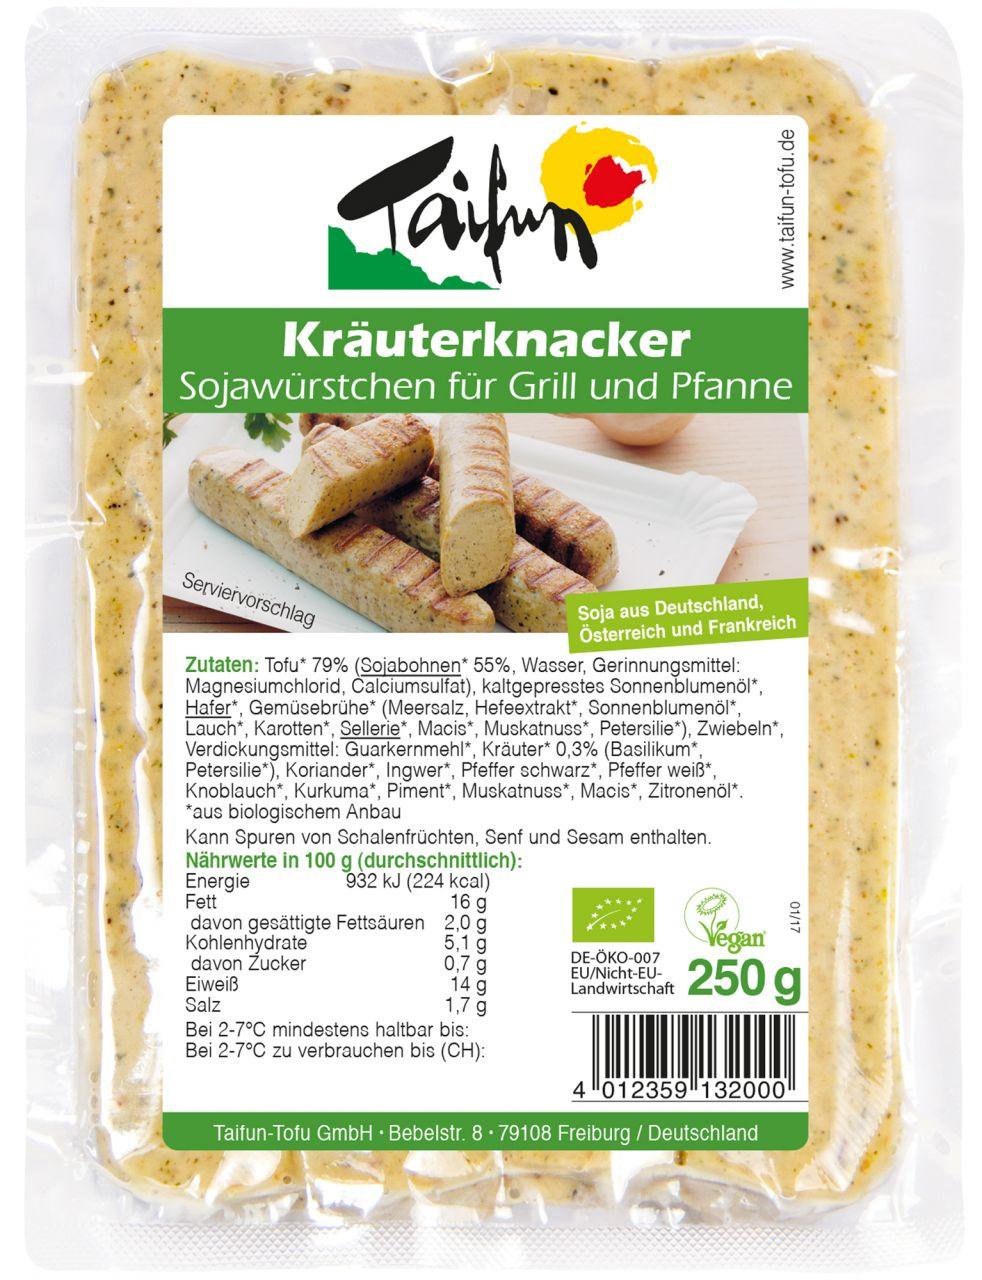 Kräuterknacker